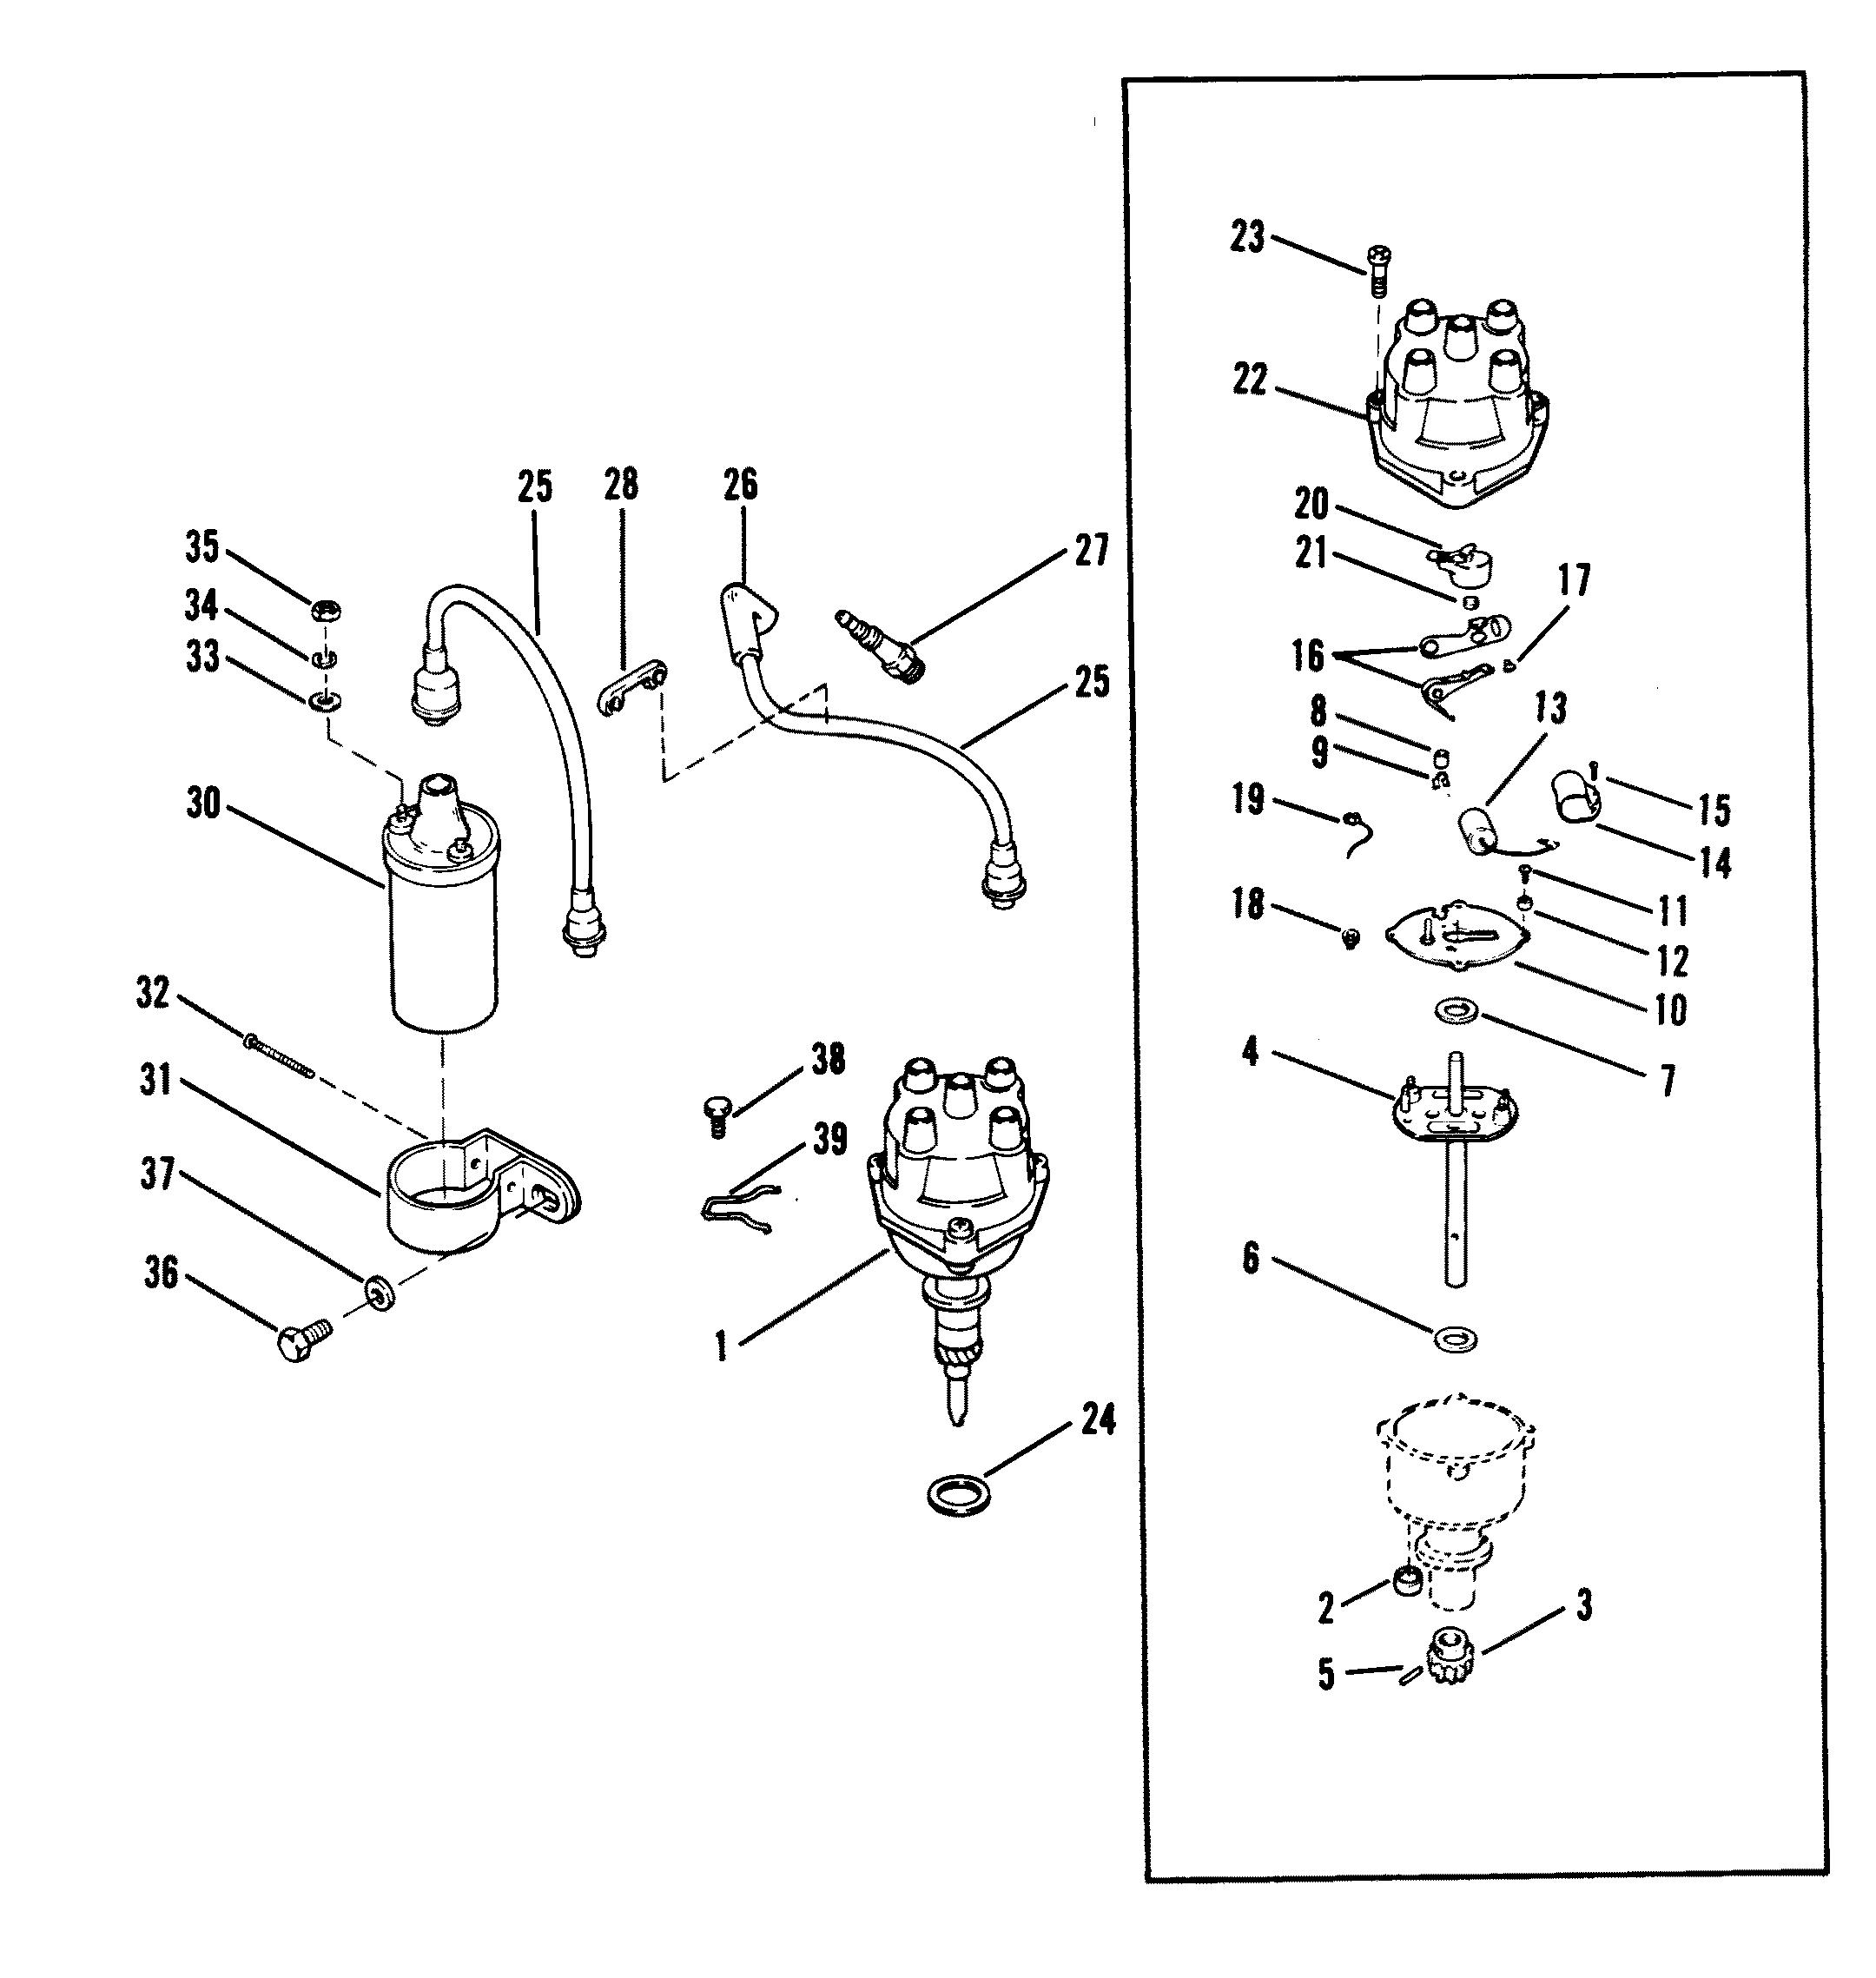 Pdf-8538] Mercruiser 1975 165 Starter Repair   2019 Ebook Library - Mercruiser 3.0 Wiring Diagram